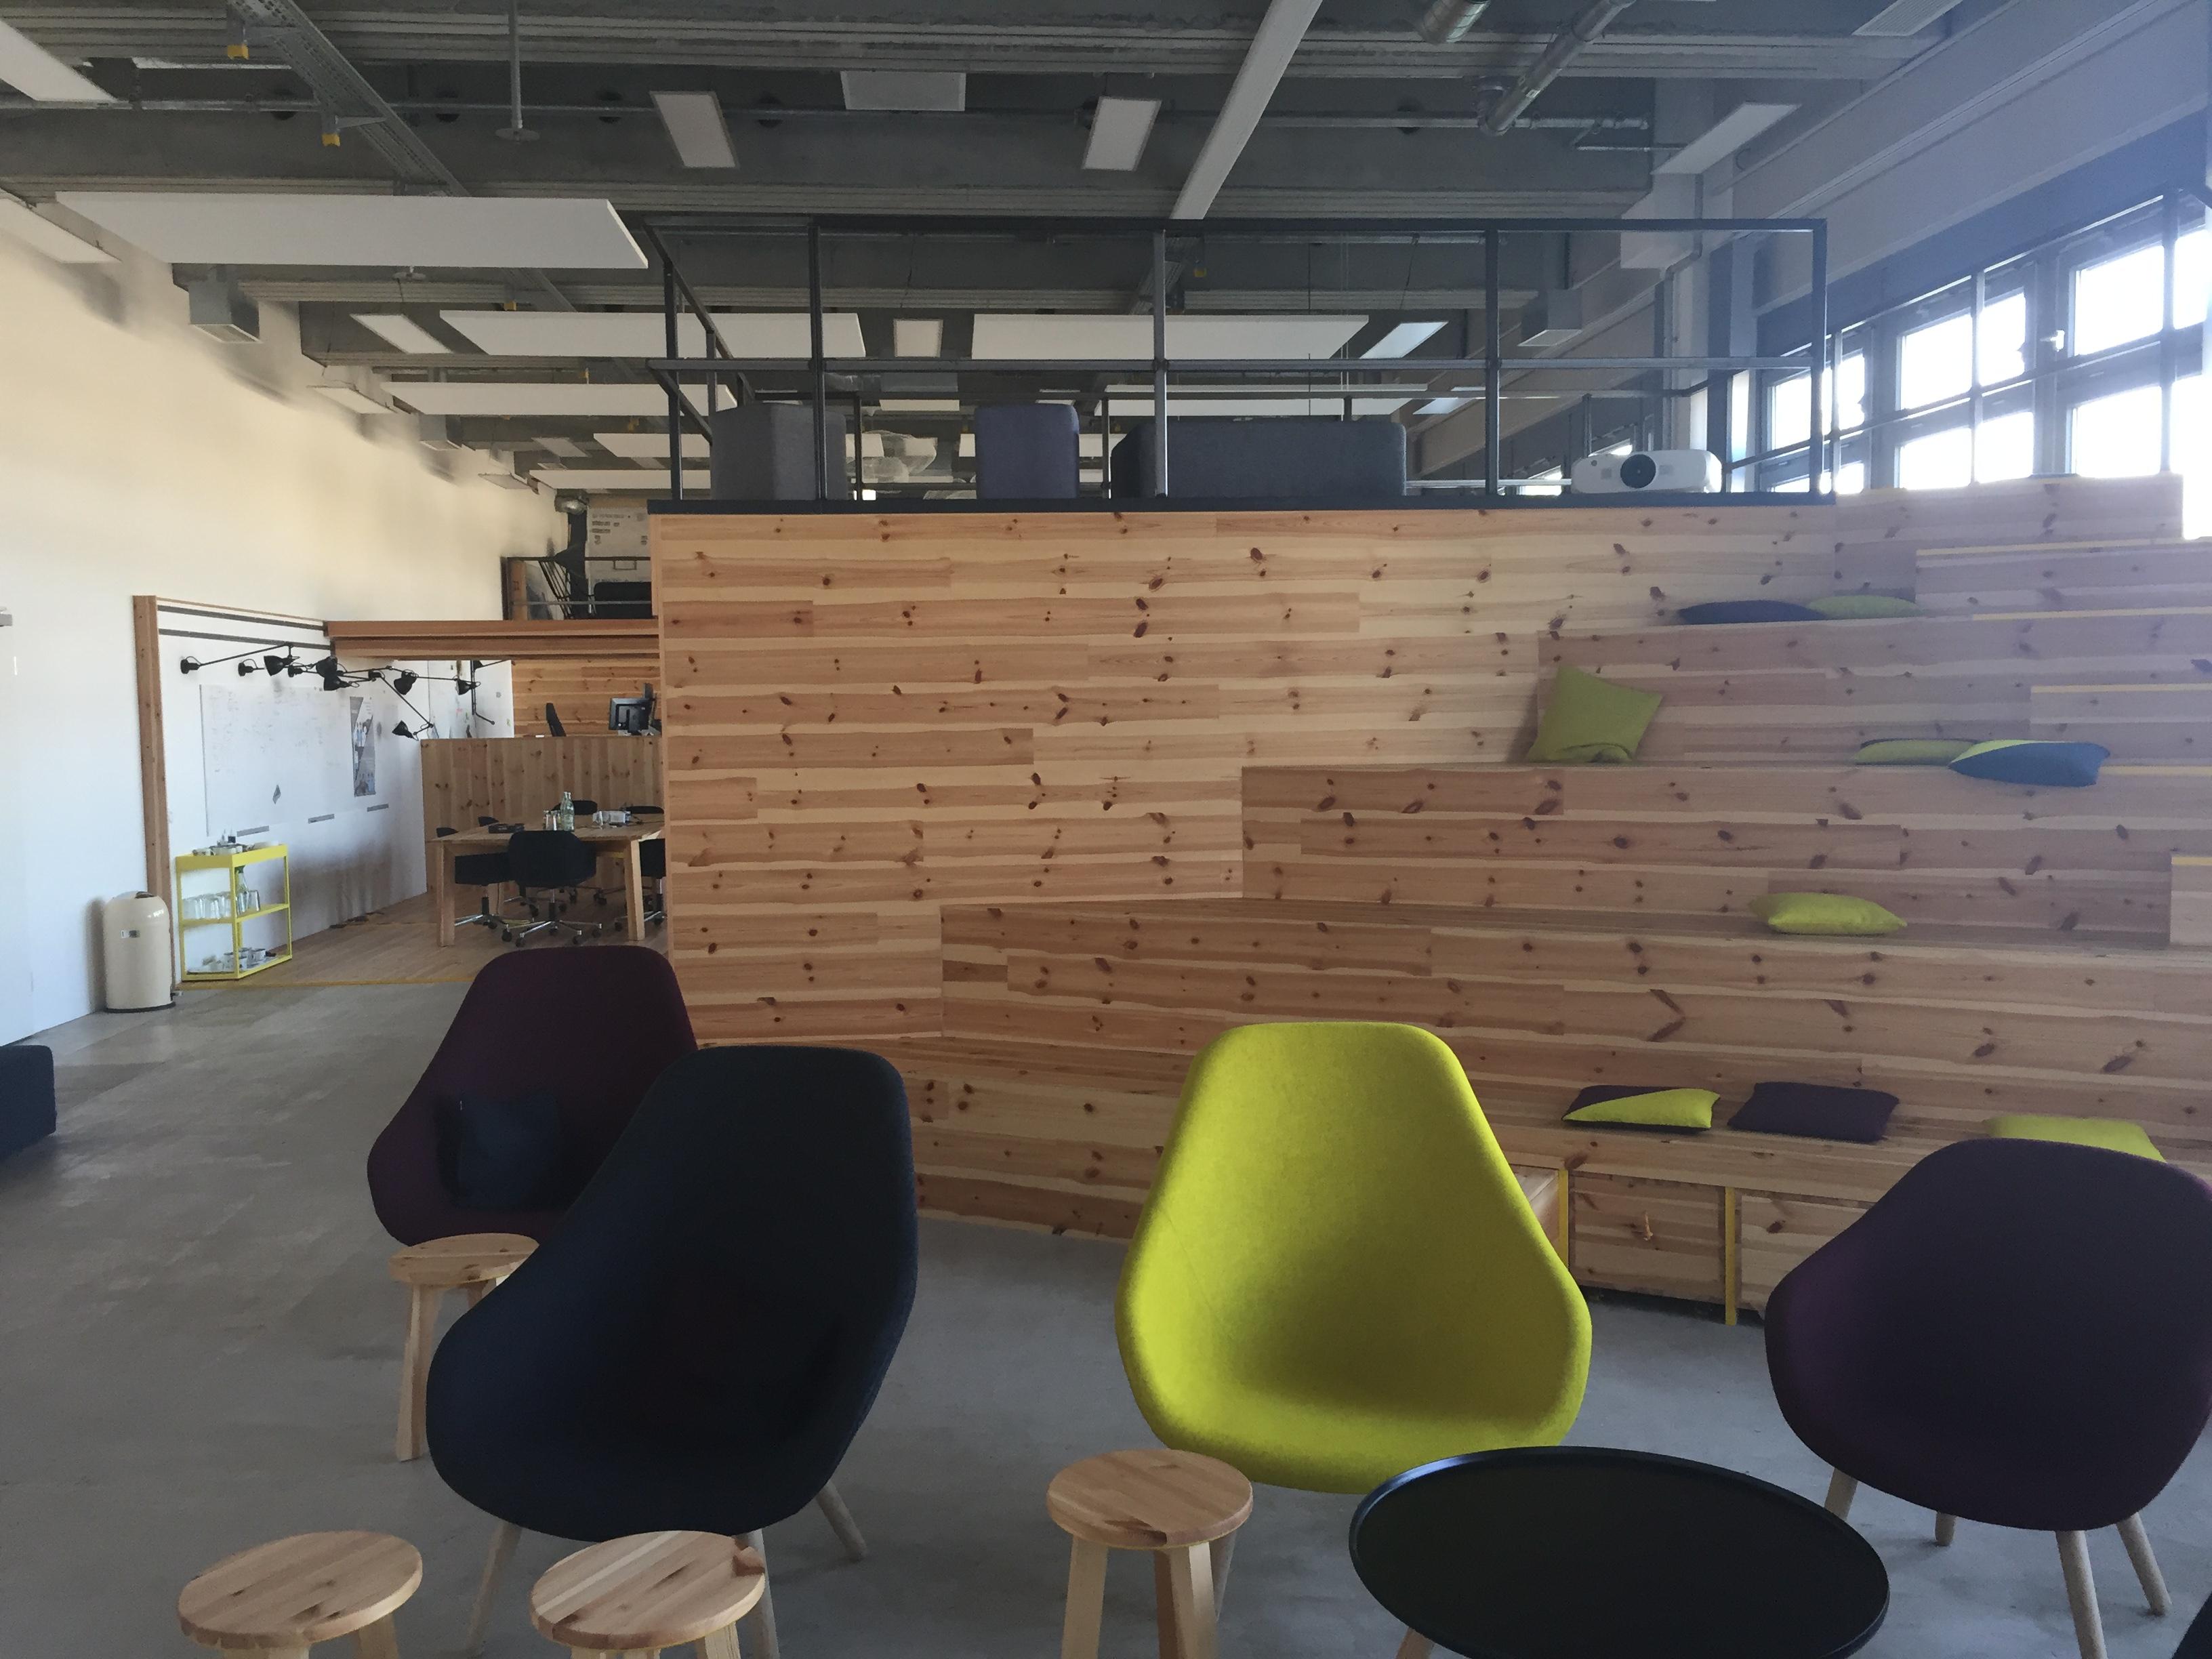 Genial File:BMW Startup Garage Office 2